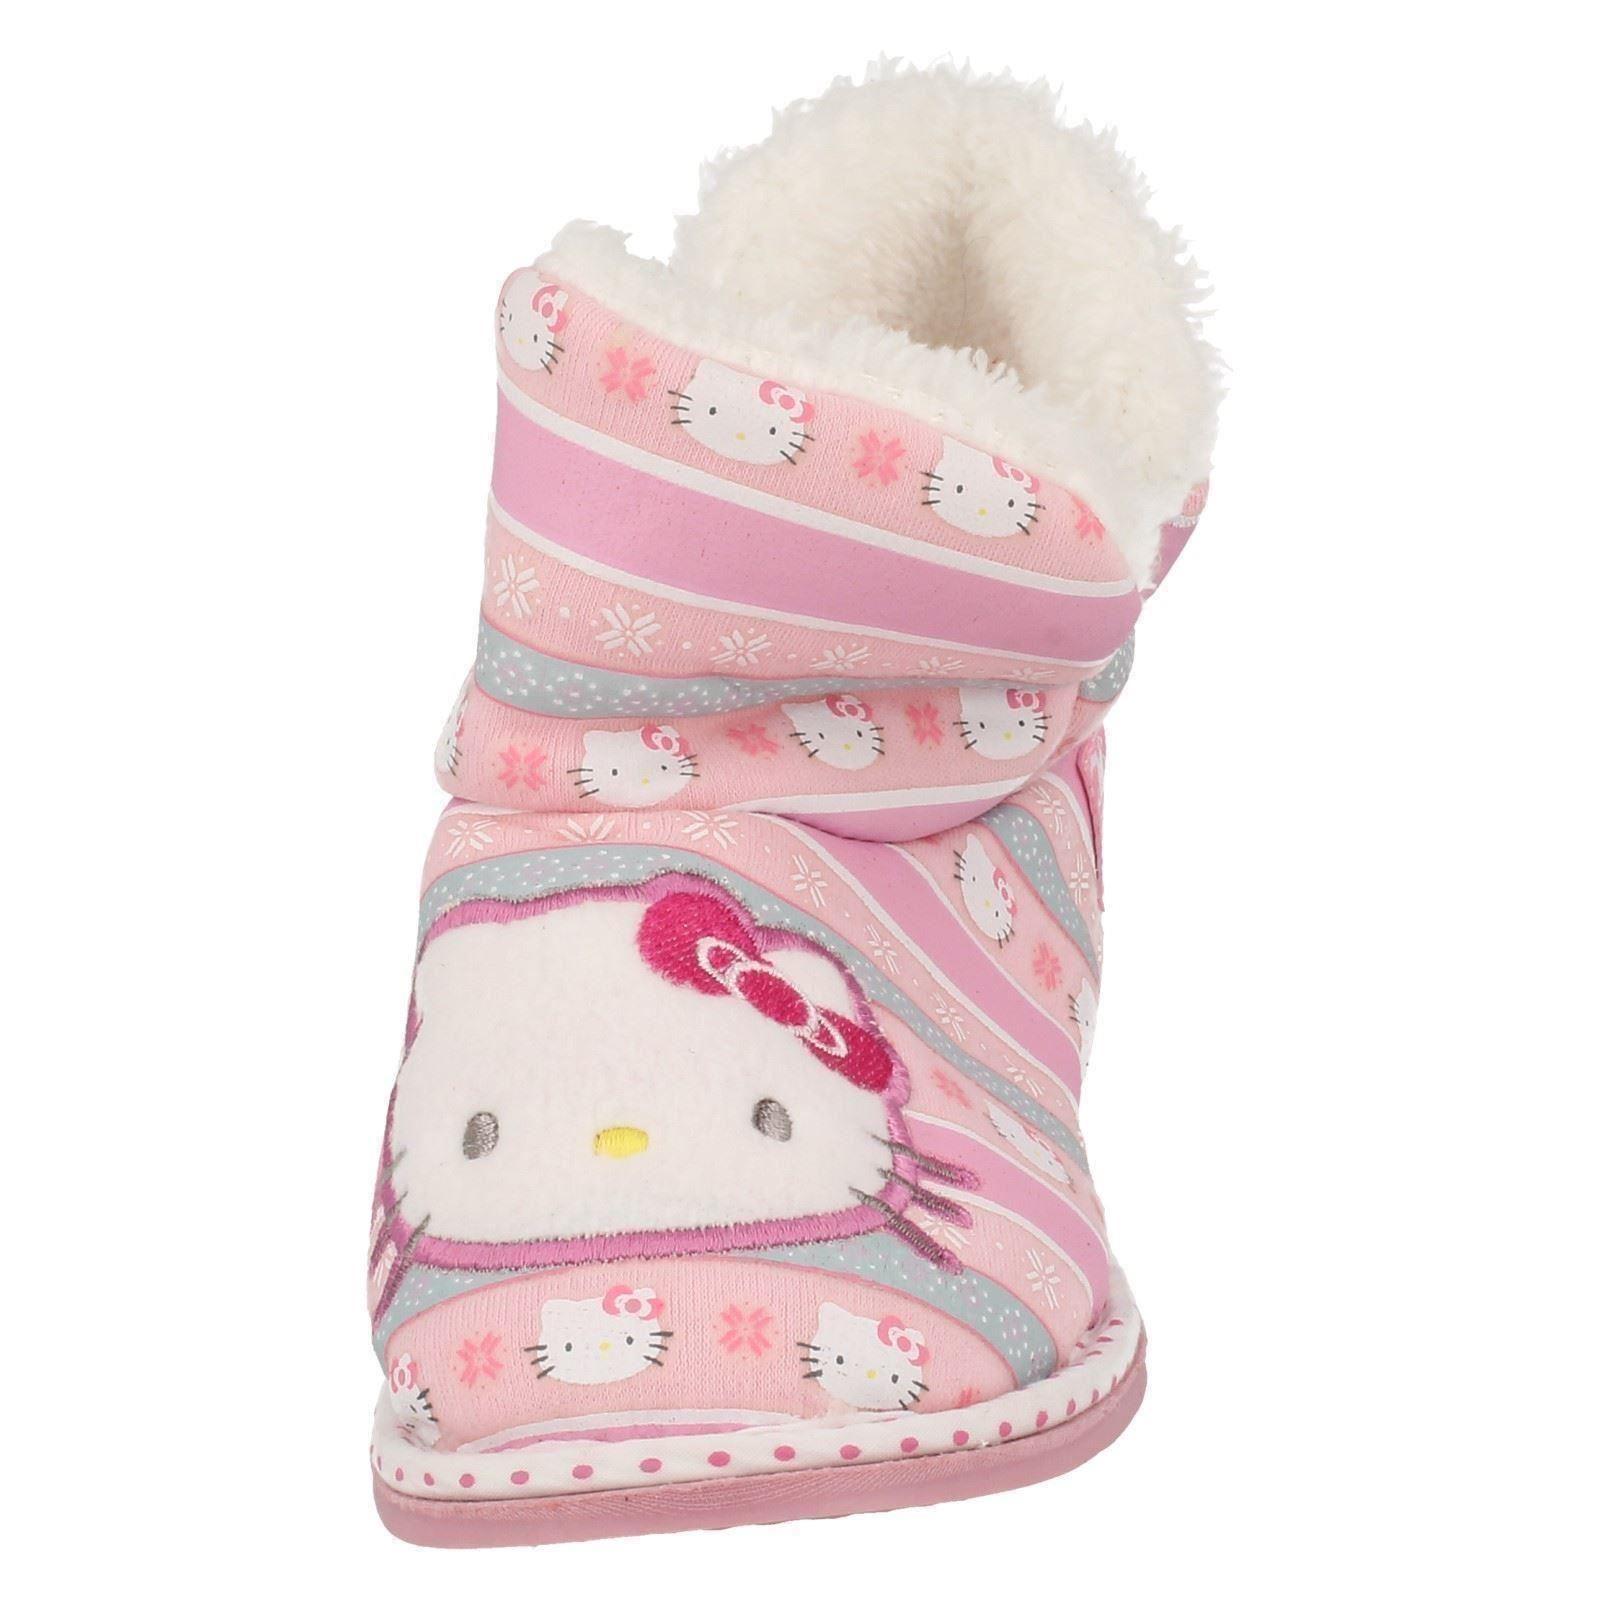 Chicas Personaje Hello Kitty Bota Zapatillas